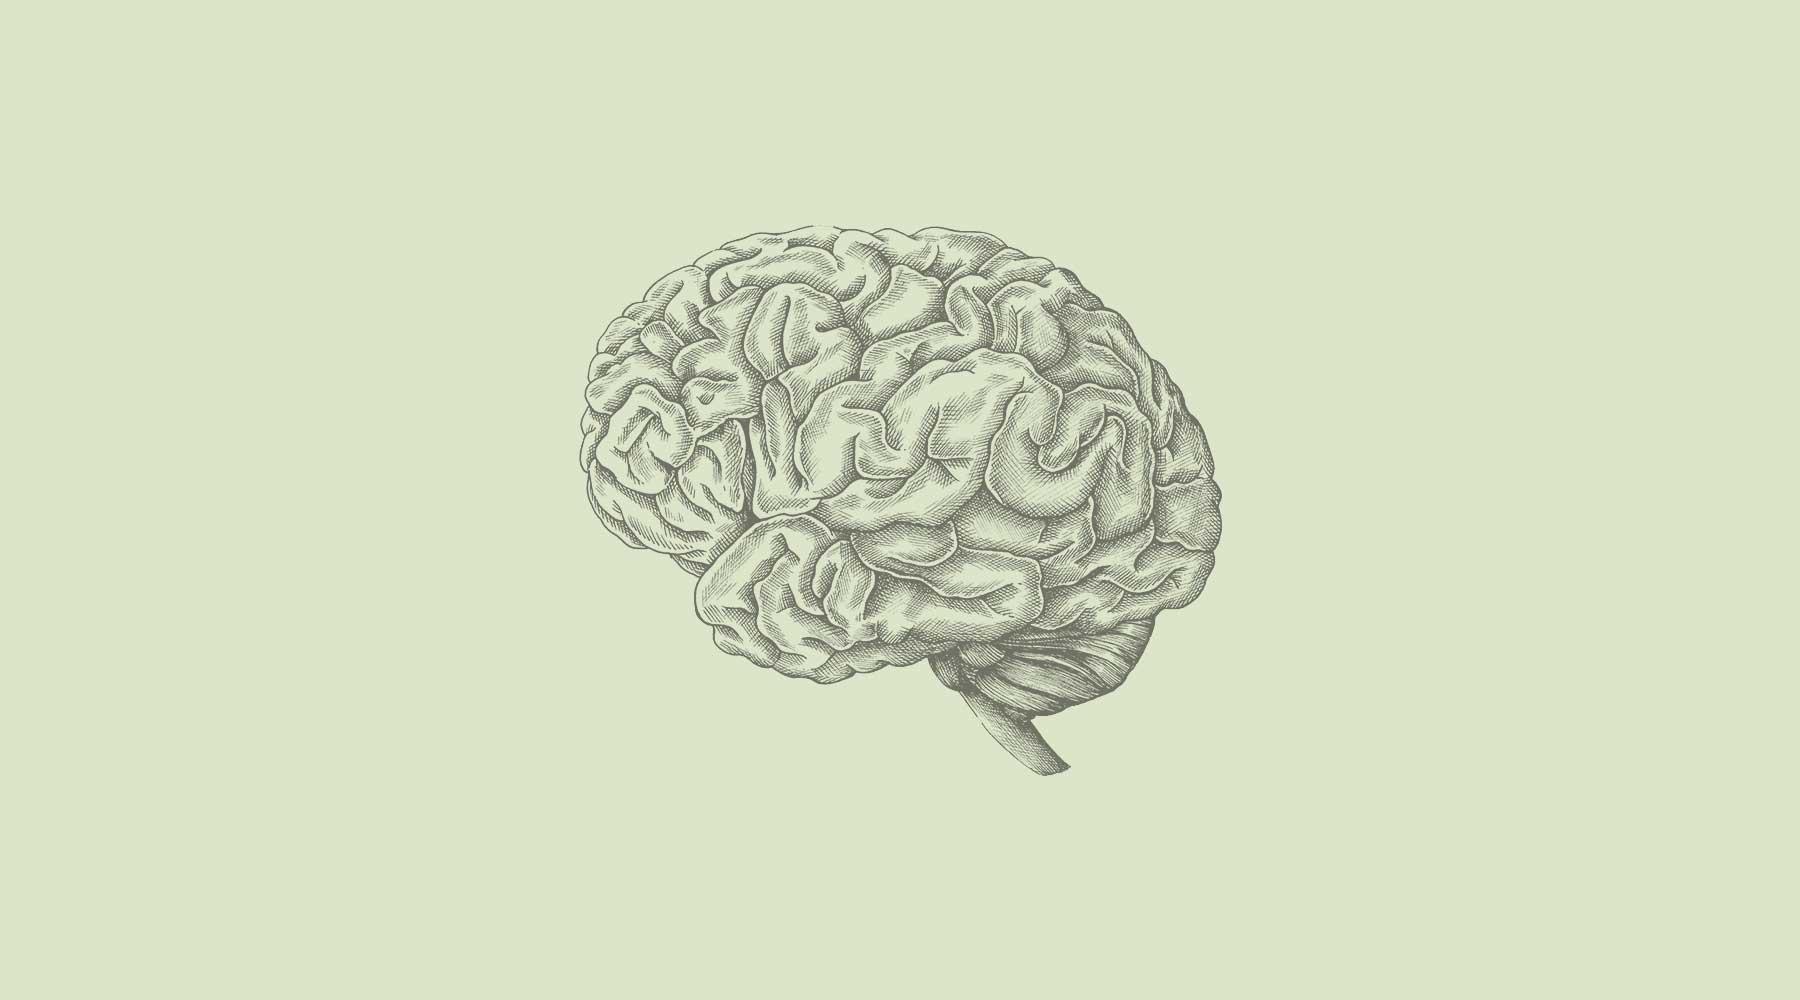 blog img migraine headaches brain alternative treatments